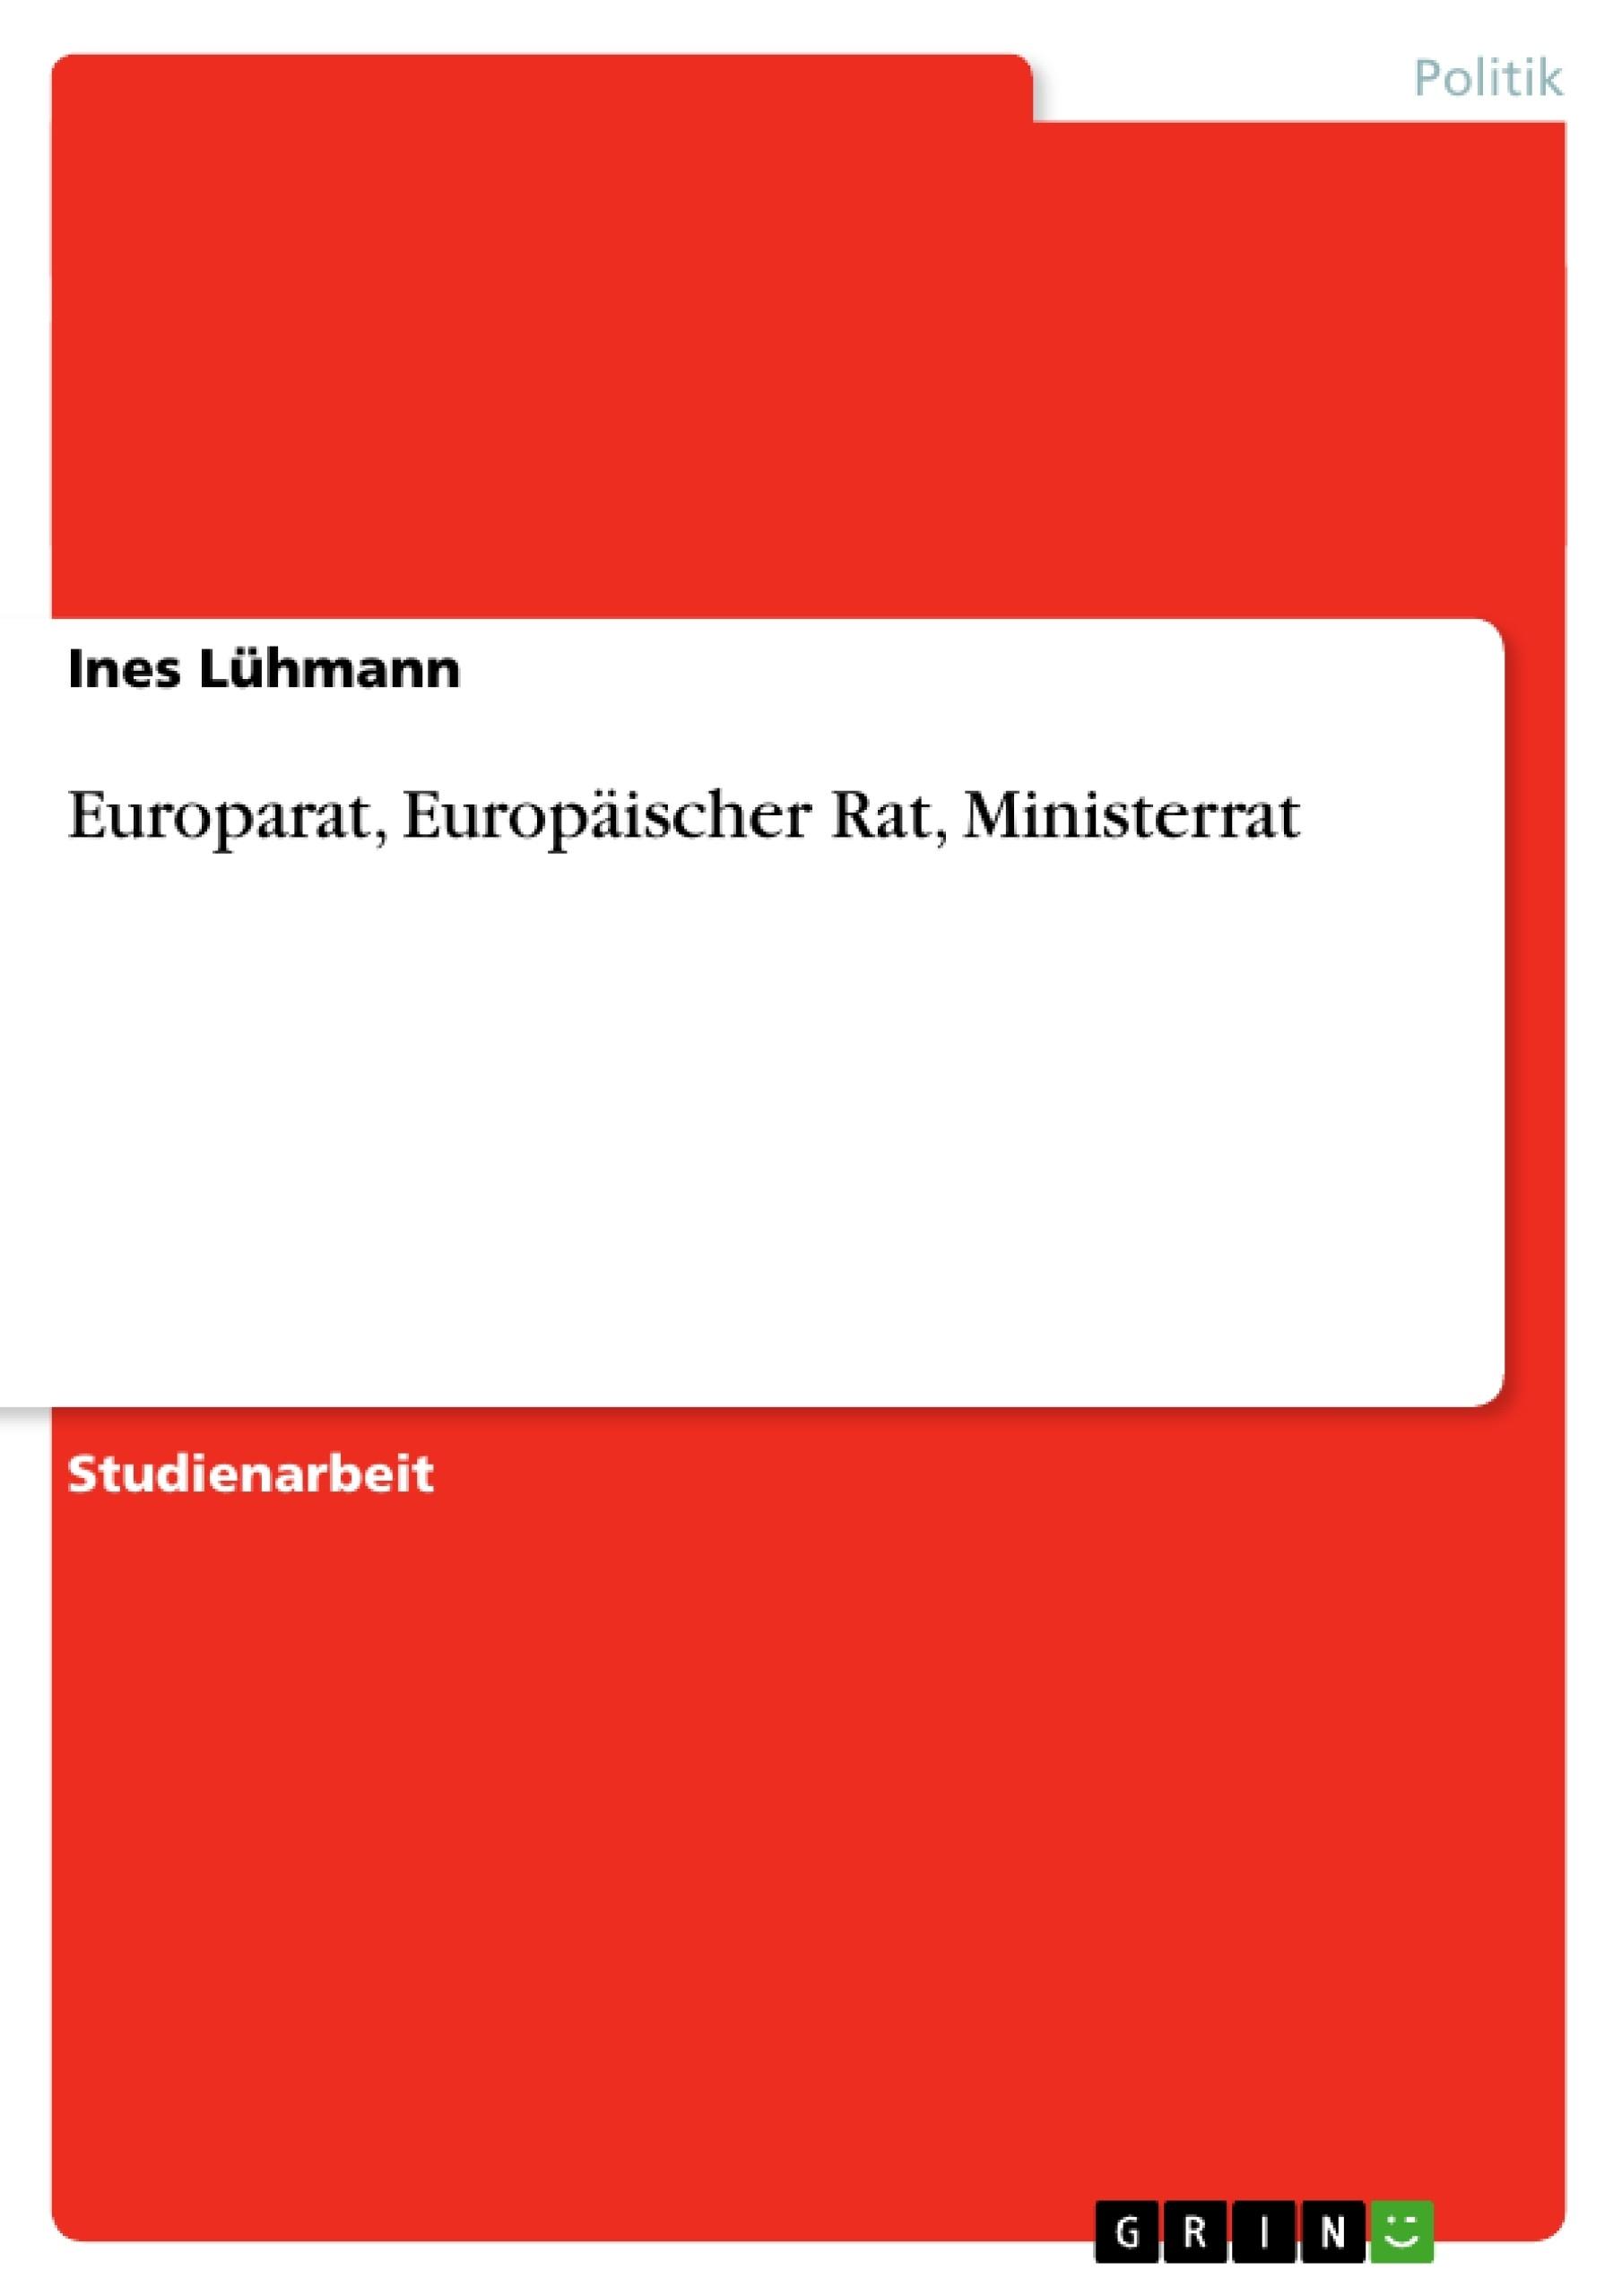 Titel: Europarat, Europäischer Rat, Ministerrat